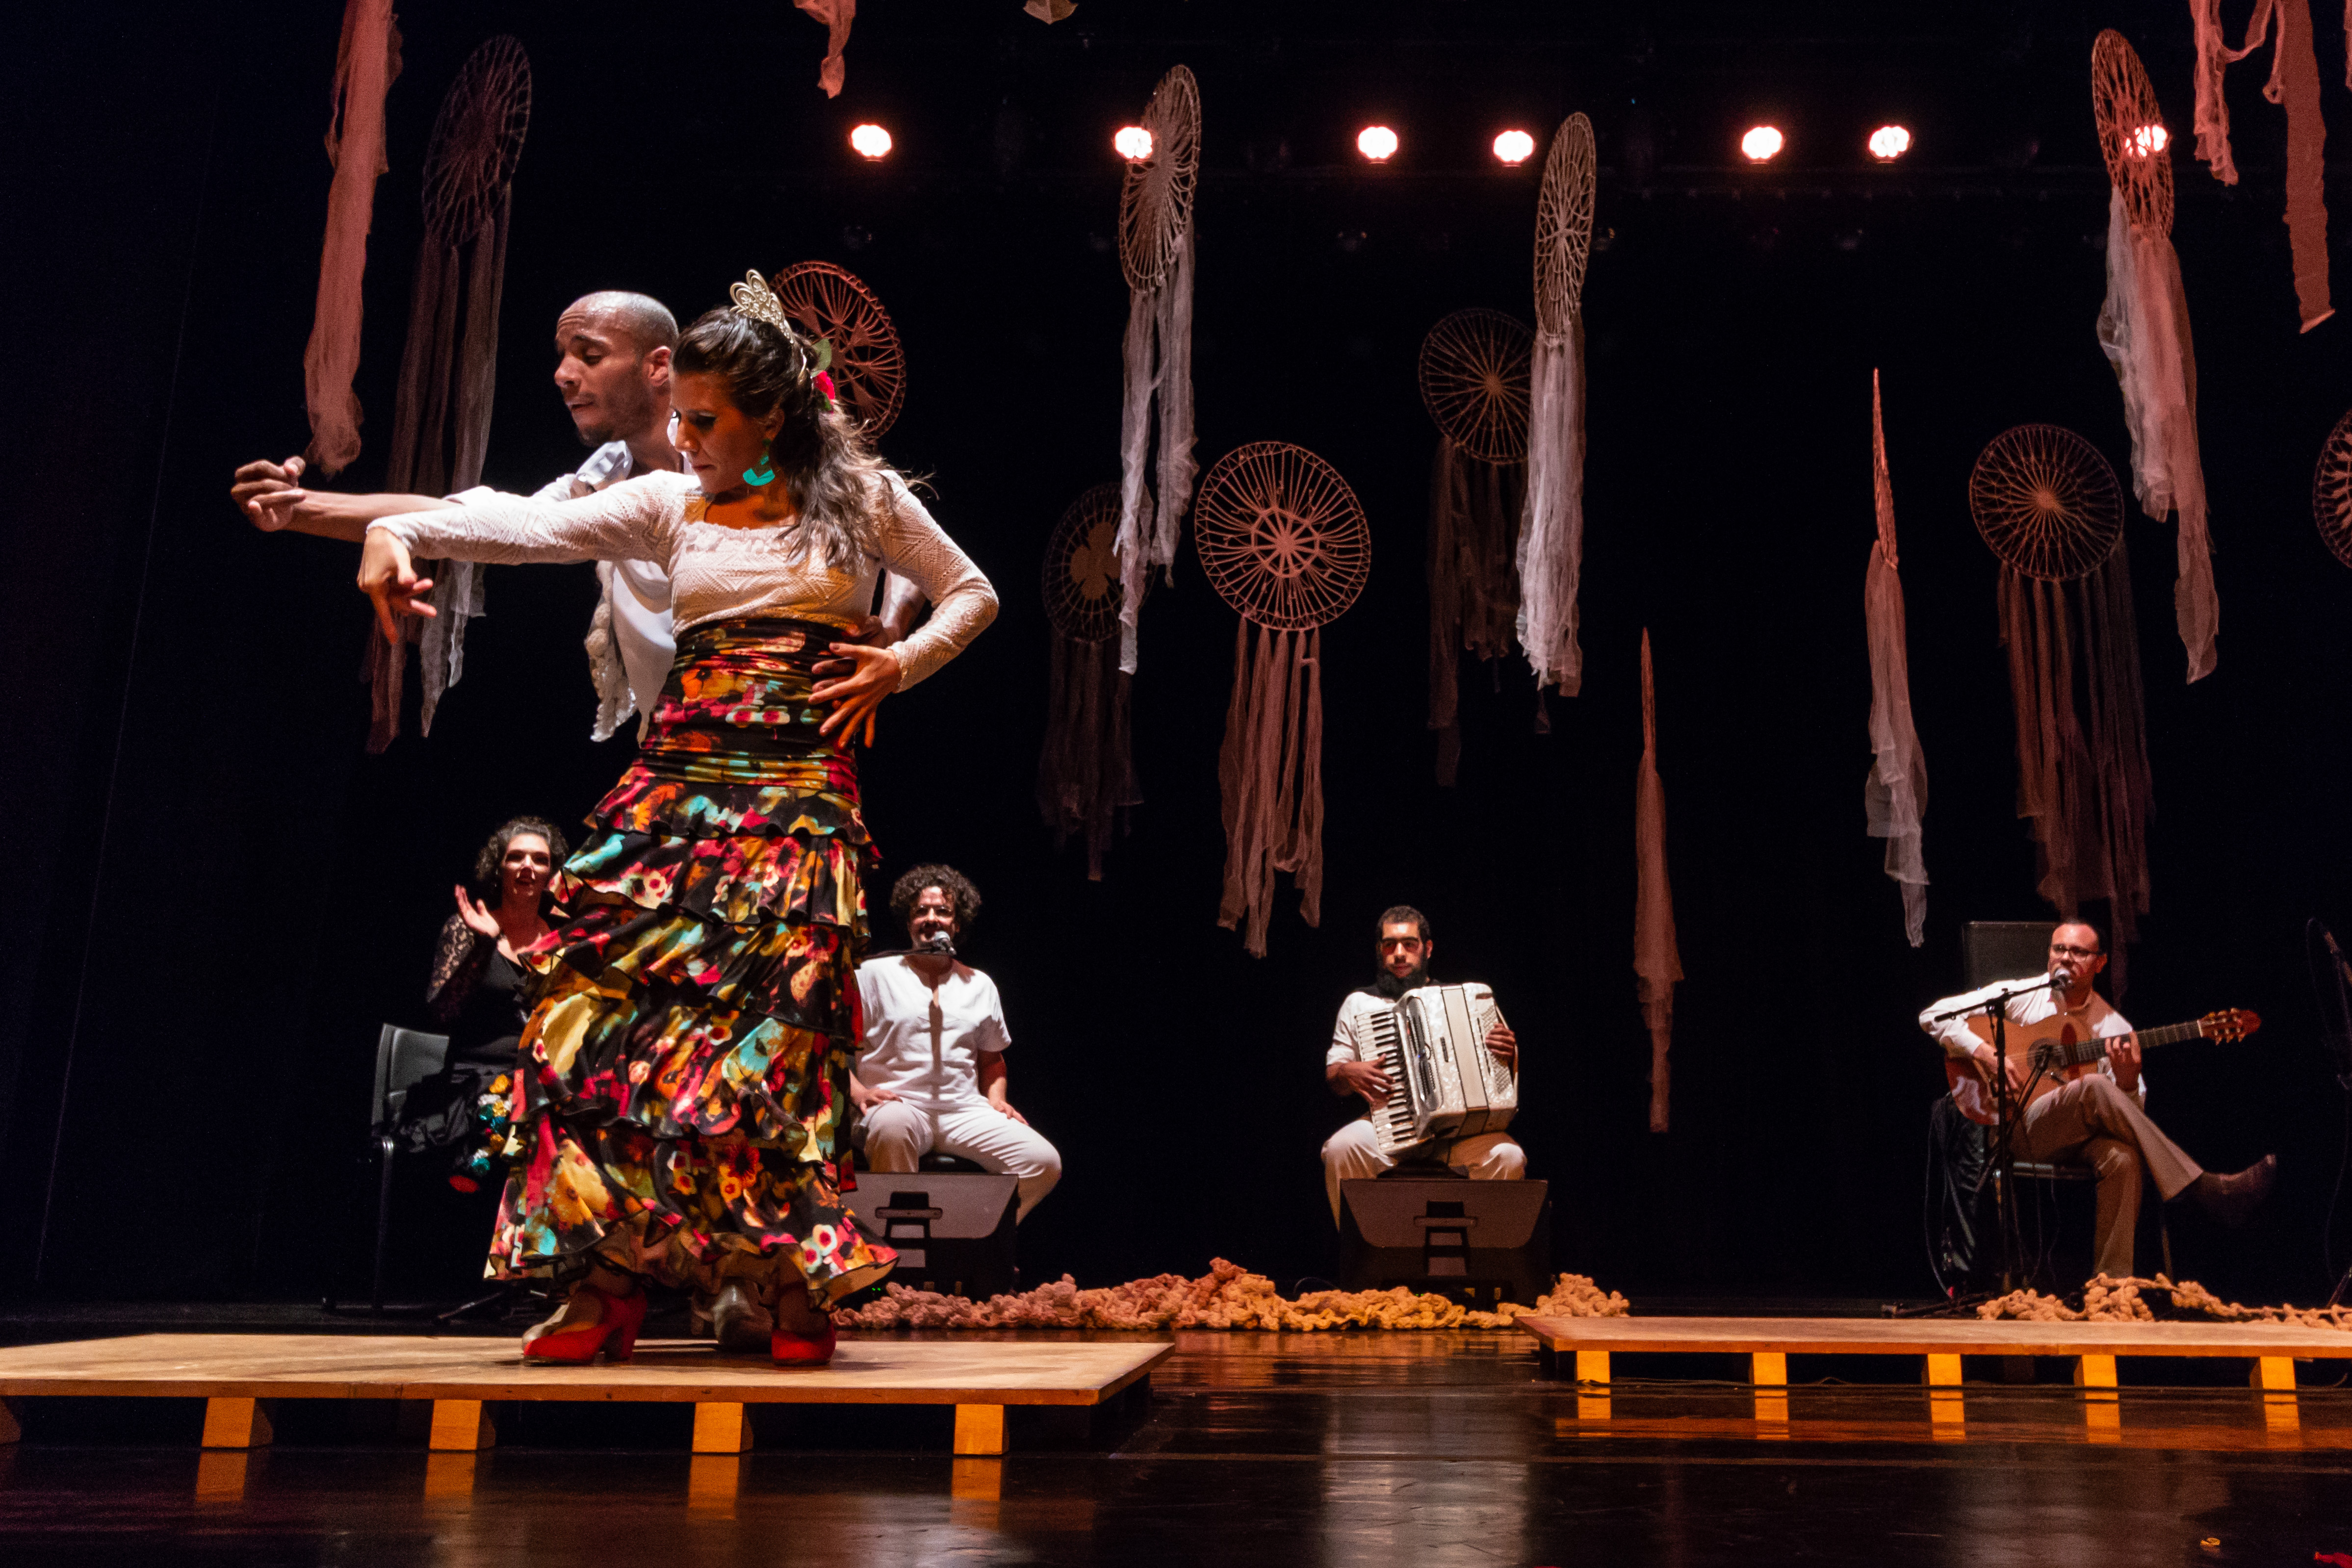 Nosso Flamenco 2018 - Foto 5 - Foto de Vitor Damiani